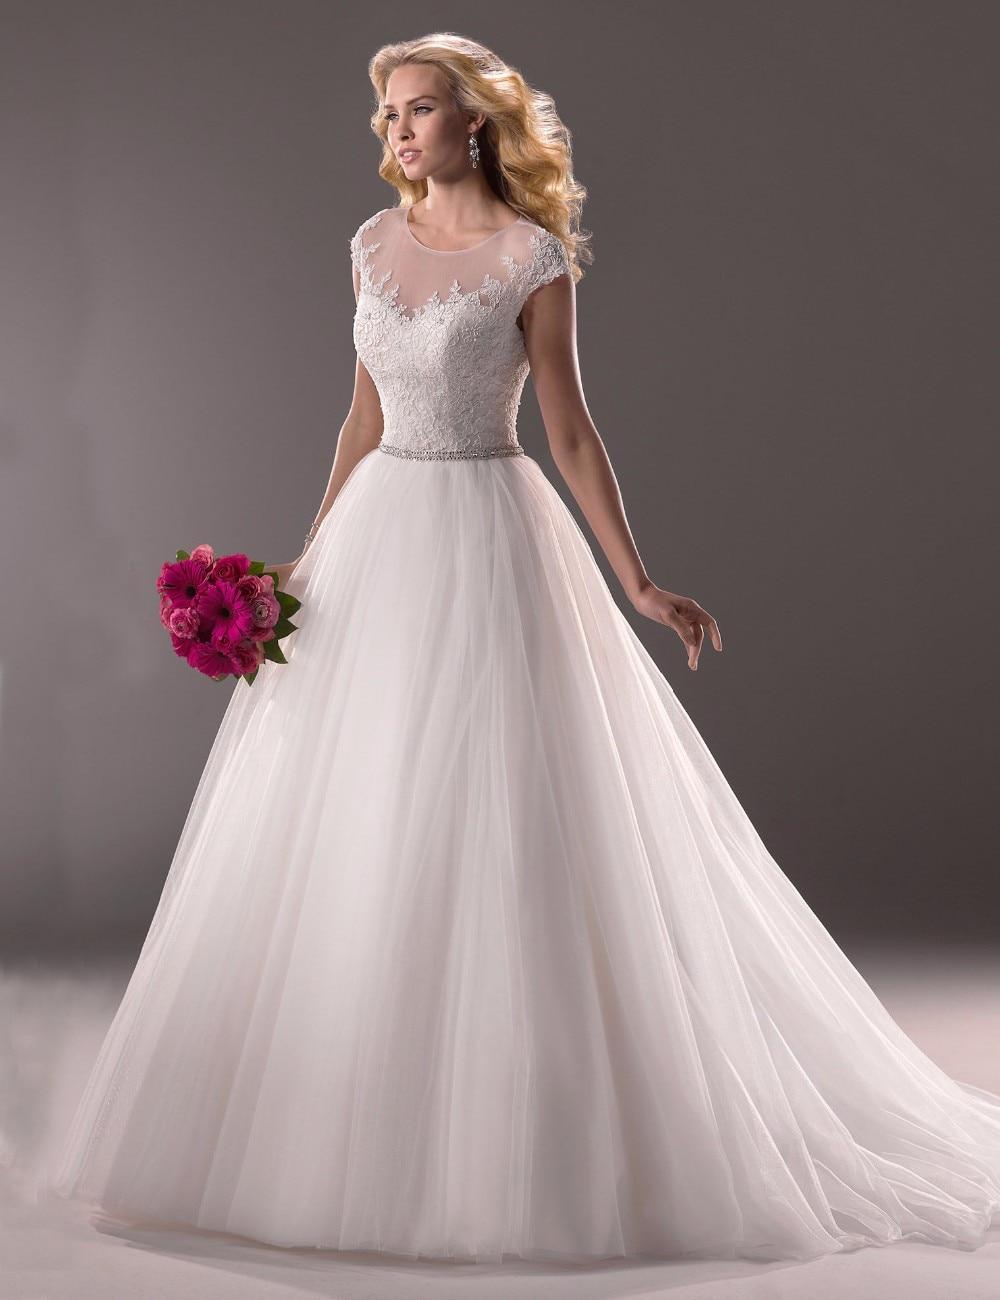 wtoo ellie cape wedding dress cape WTOO Ellie Bridal Cape